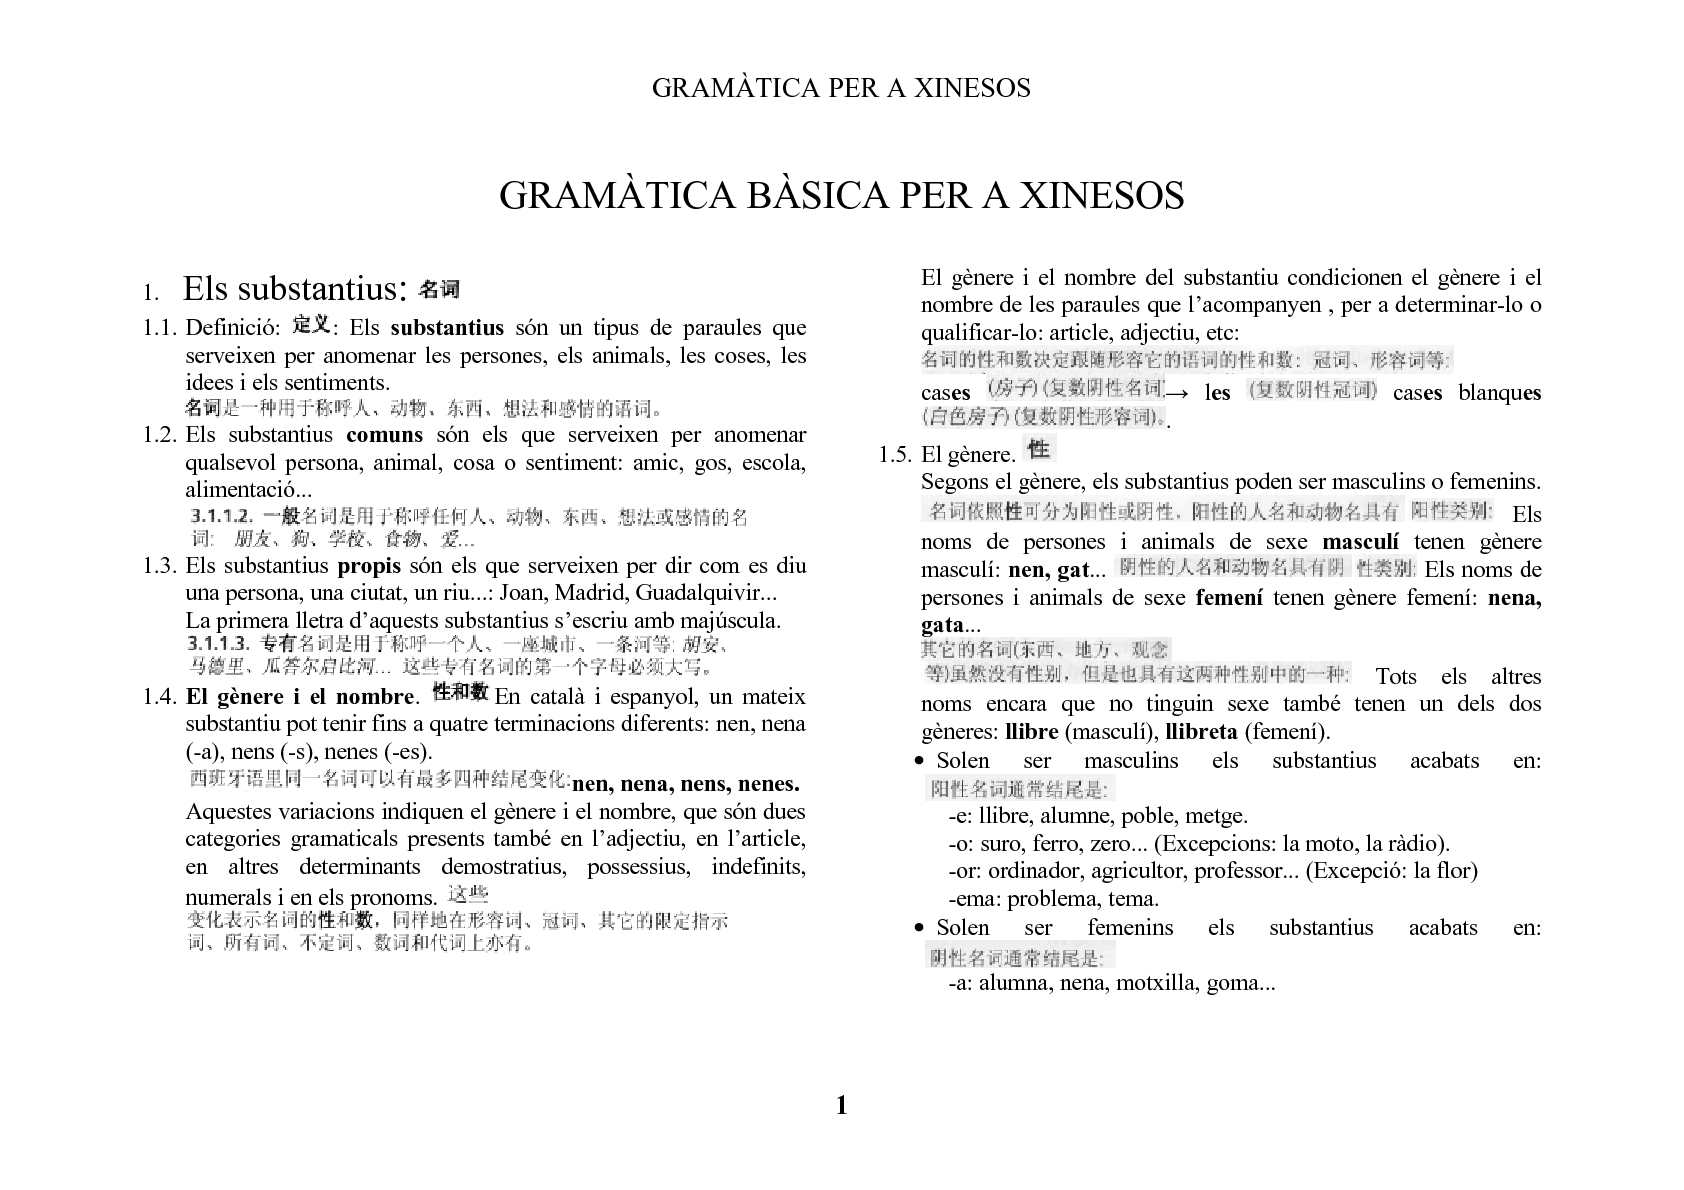 GRAMXINES01